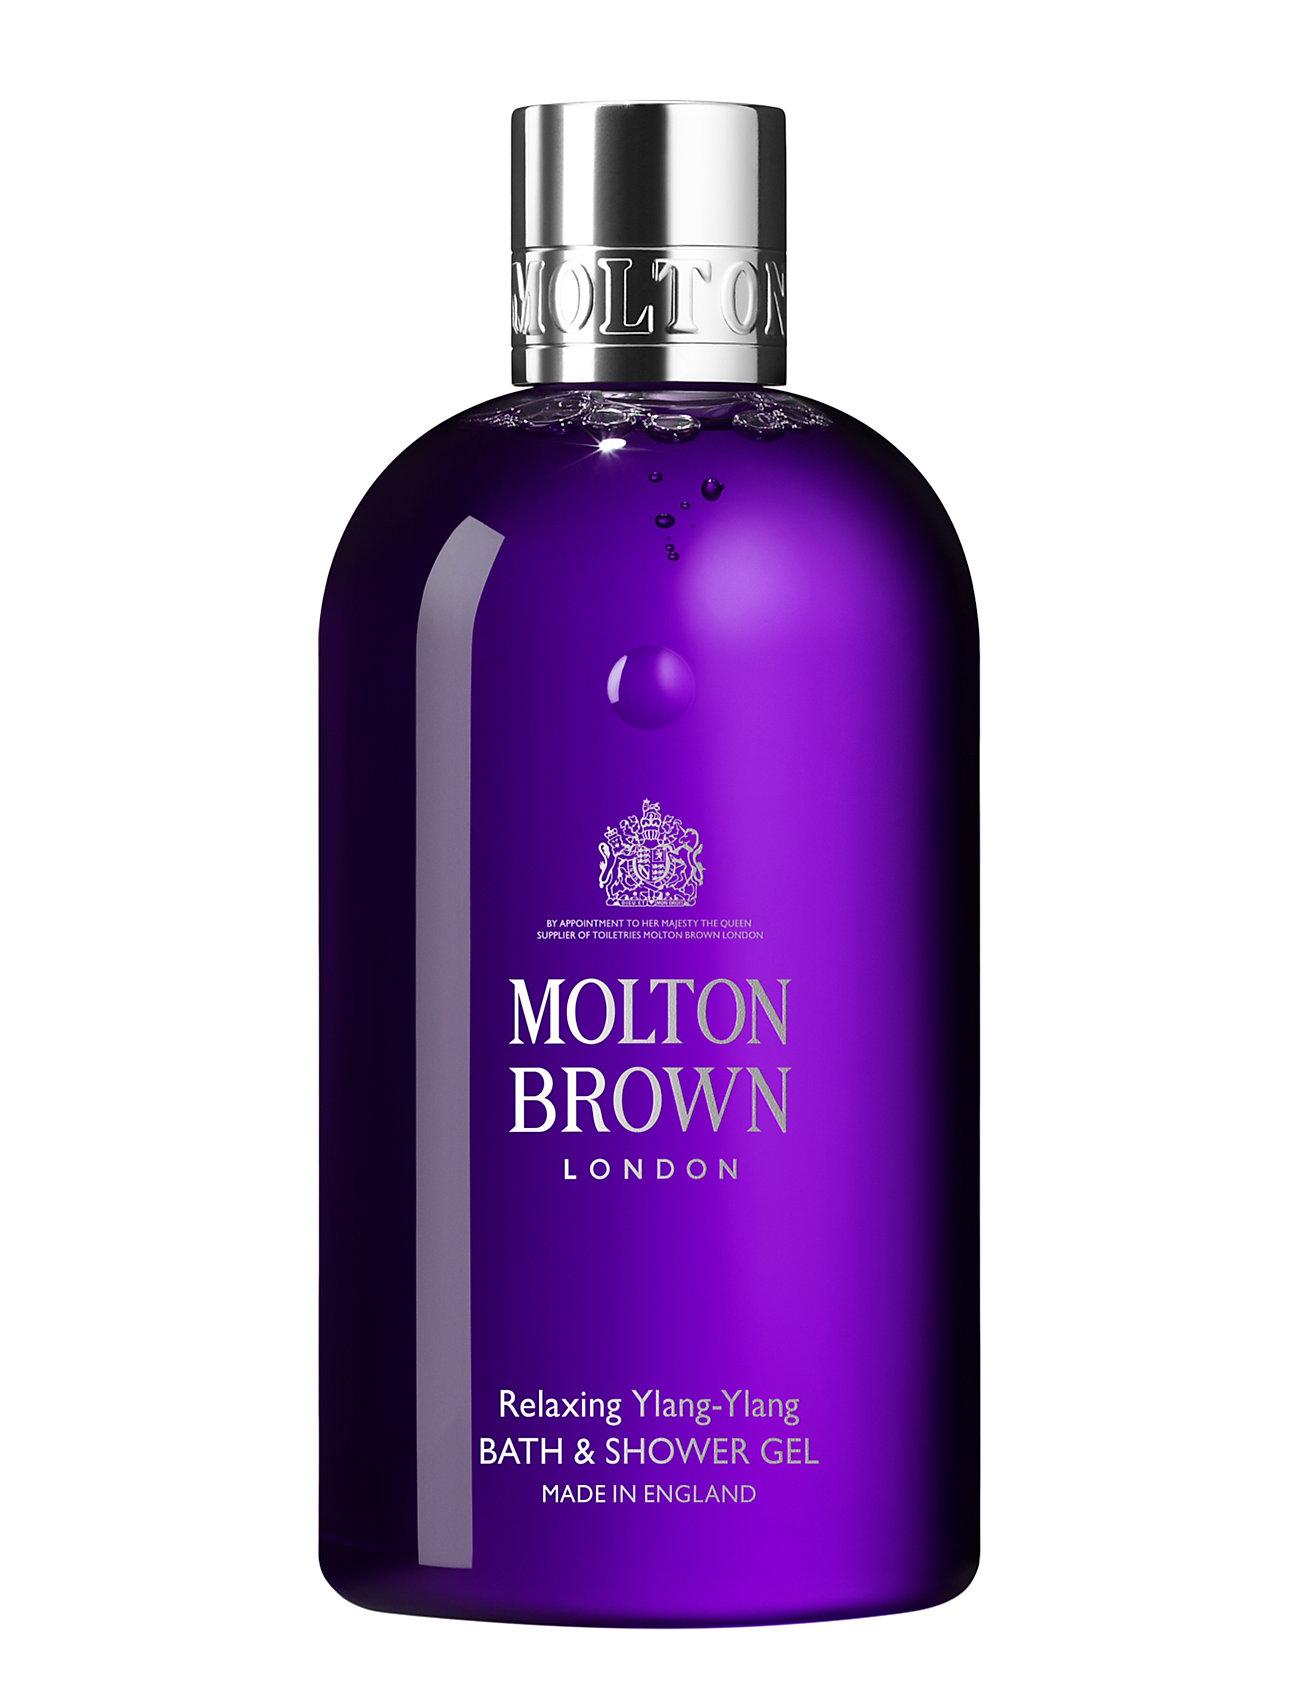 Molton Brown Relaxing Ylang-Ylang Bath & Shower Gel - NO COLOUR